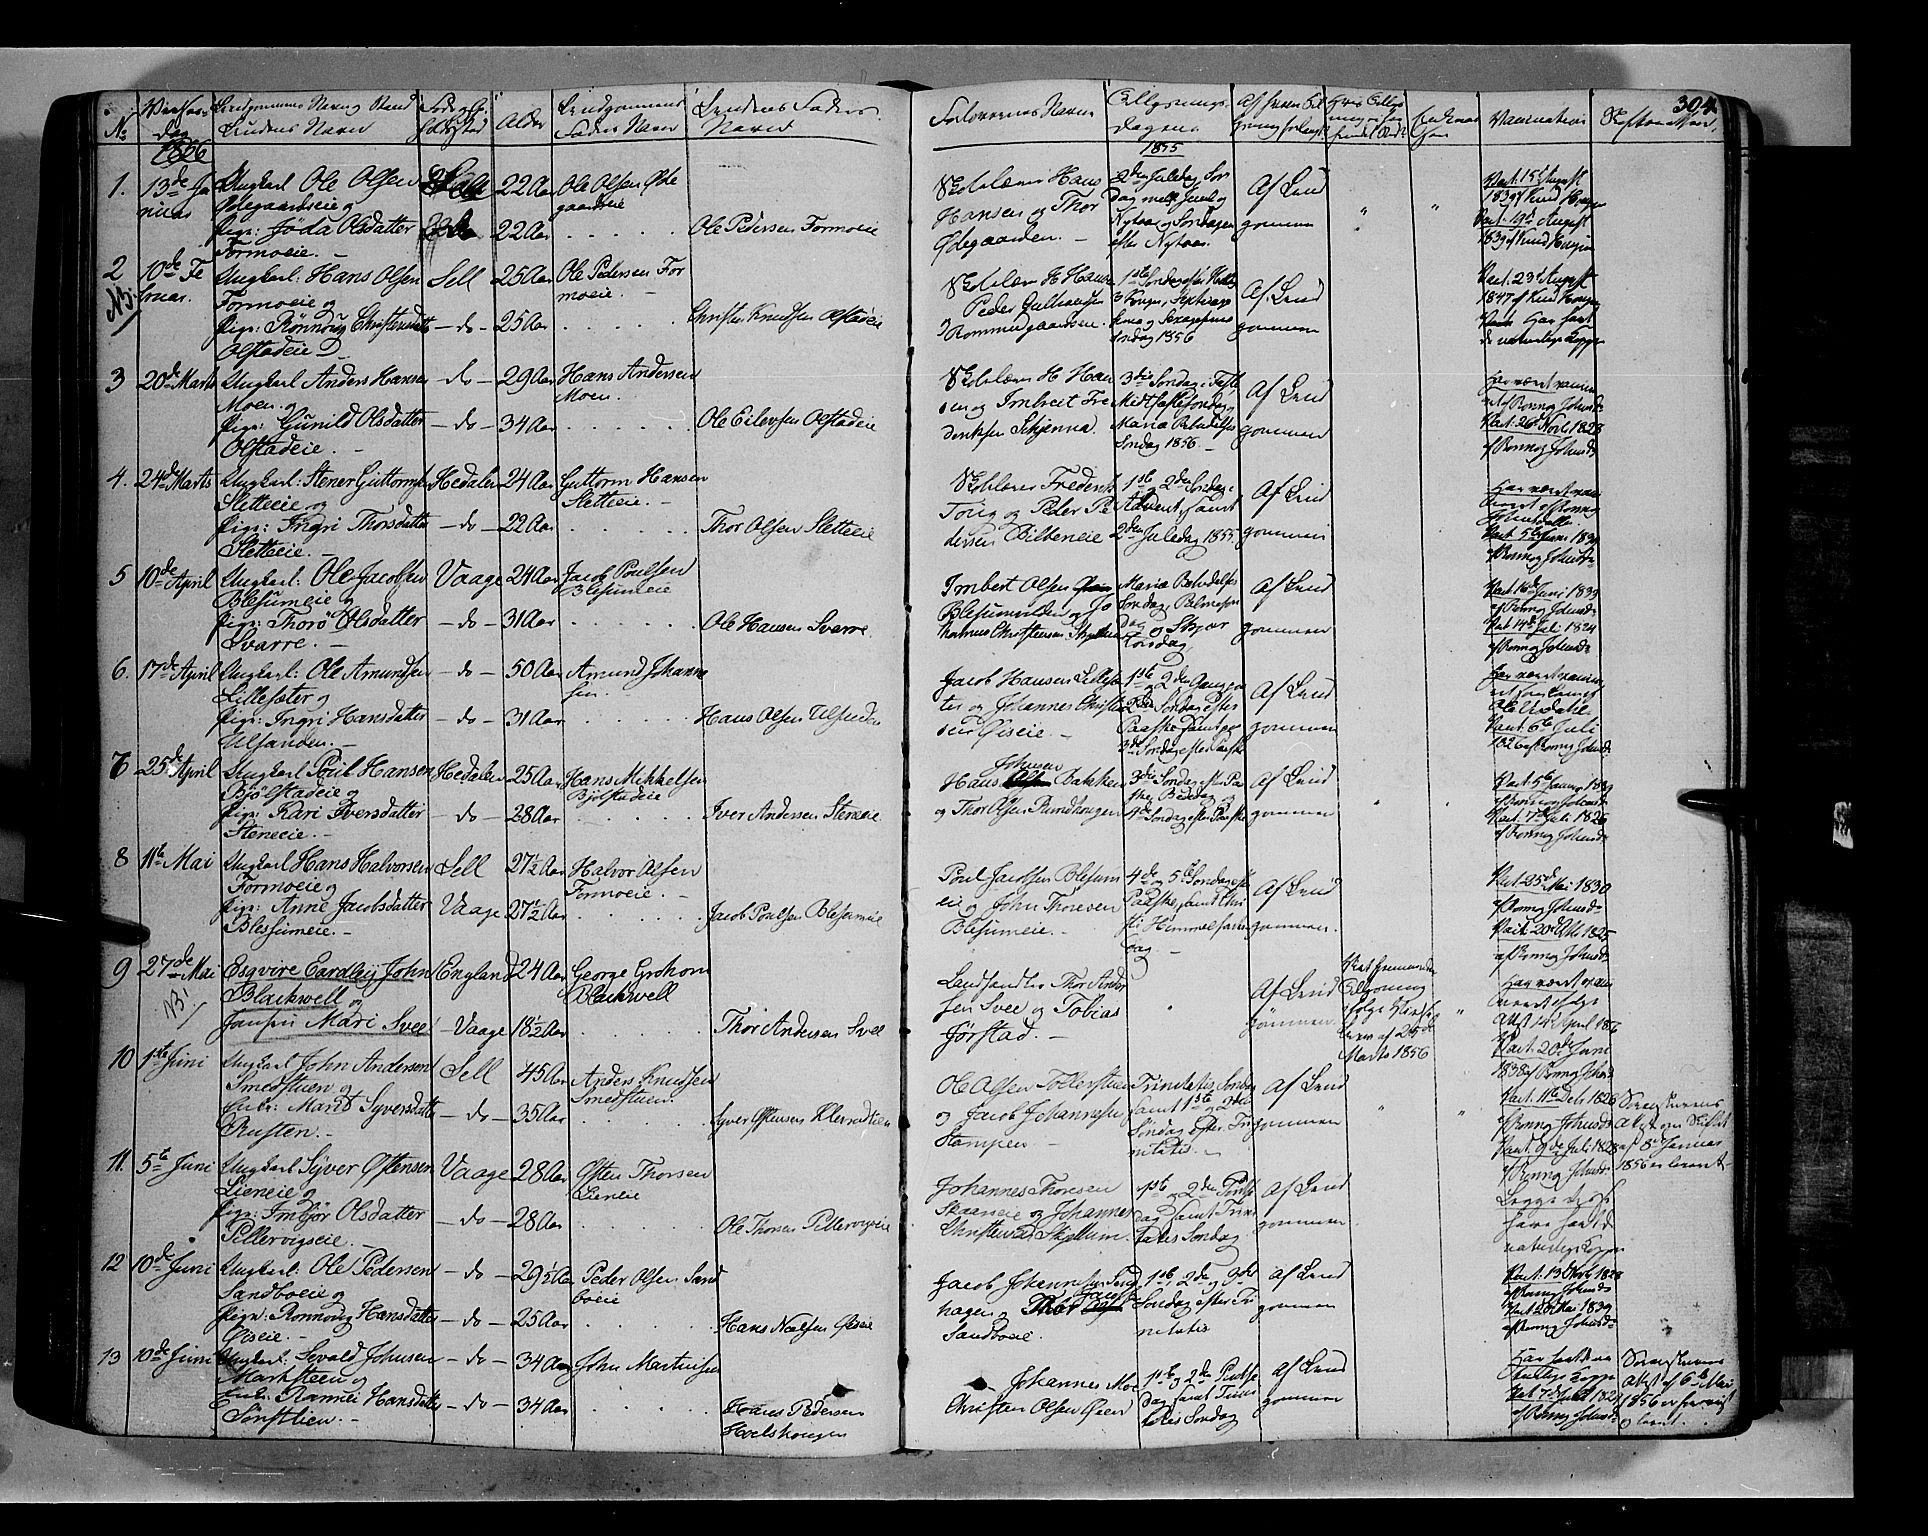 SAH, Vågå prestekontor, Ministerialbok nr. 5 /1, 1842-1856, s. 304